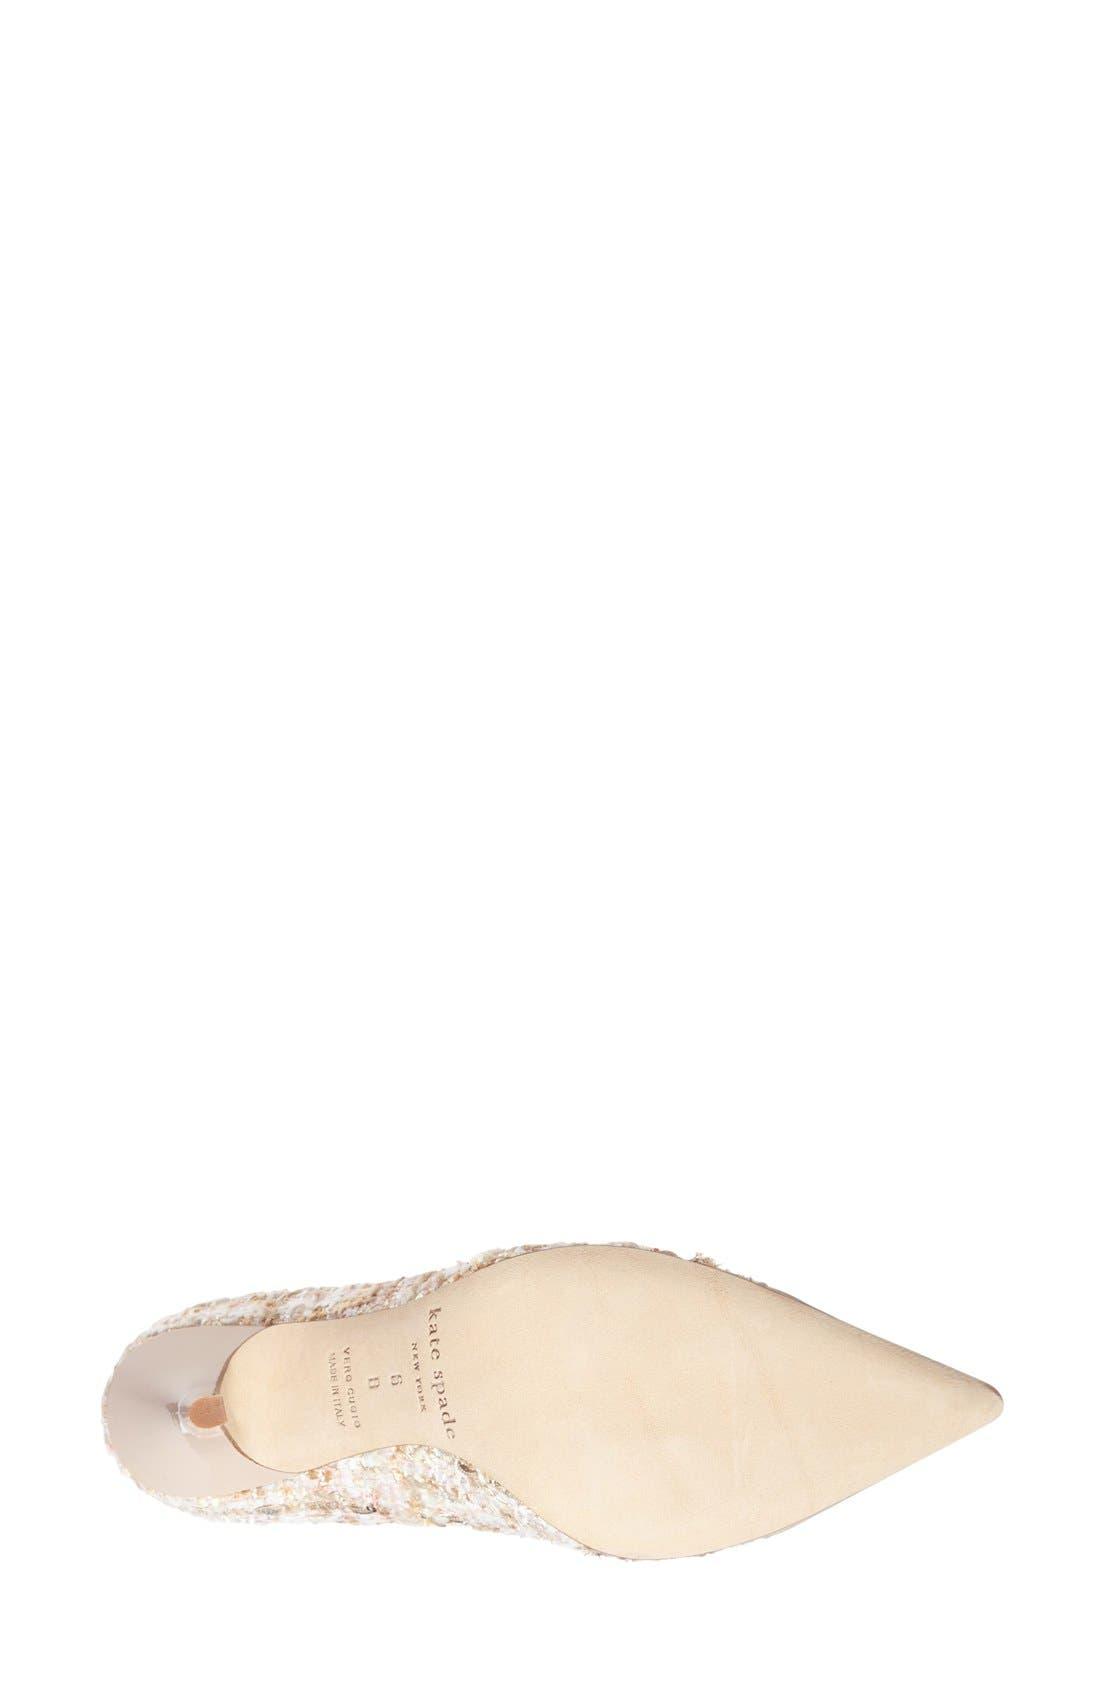 Alternate Image 4  - kate spade new york 'lacy' pointy toe pump (Women)